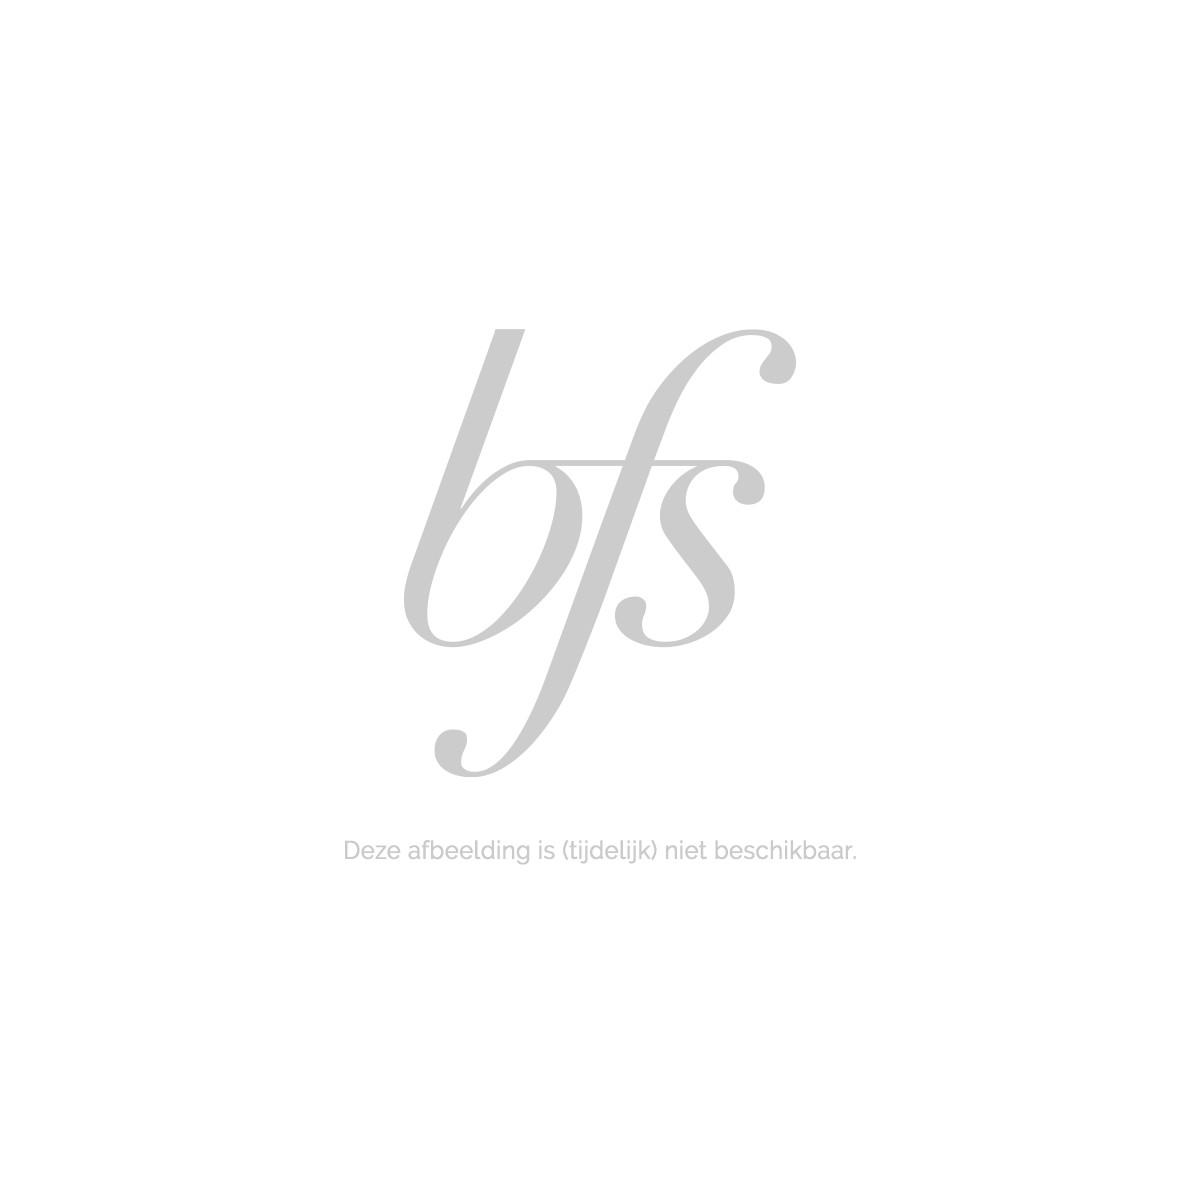 beMineral Brush Flat Liner